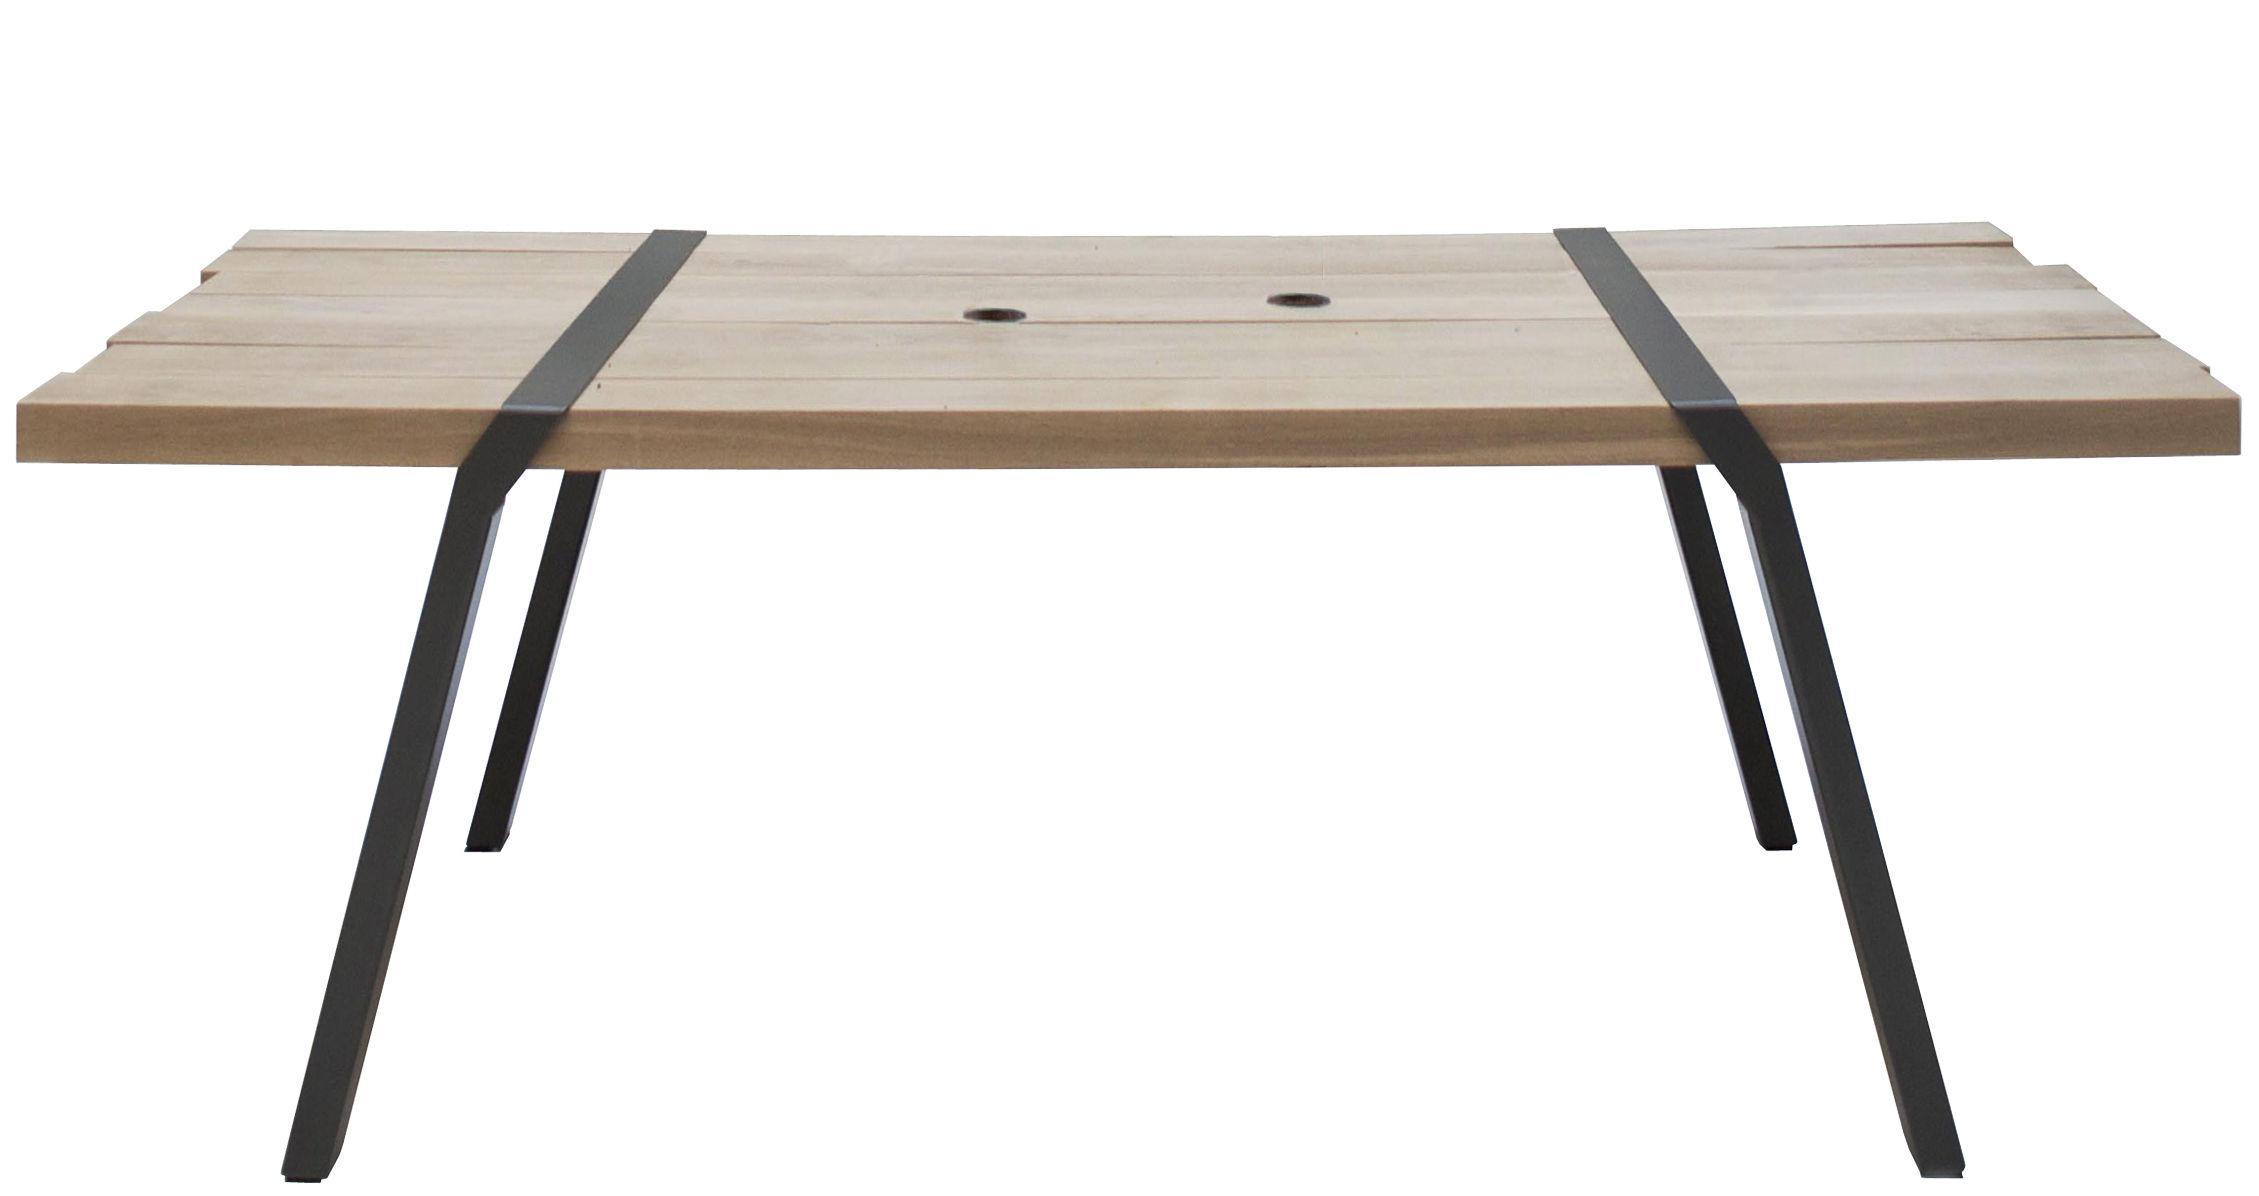 Outdoor - Garden Tables - Pi Rectangular table by Moaroom - Grey gun barrel - Painted steel, Solid oak